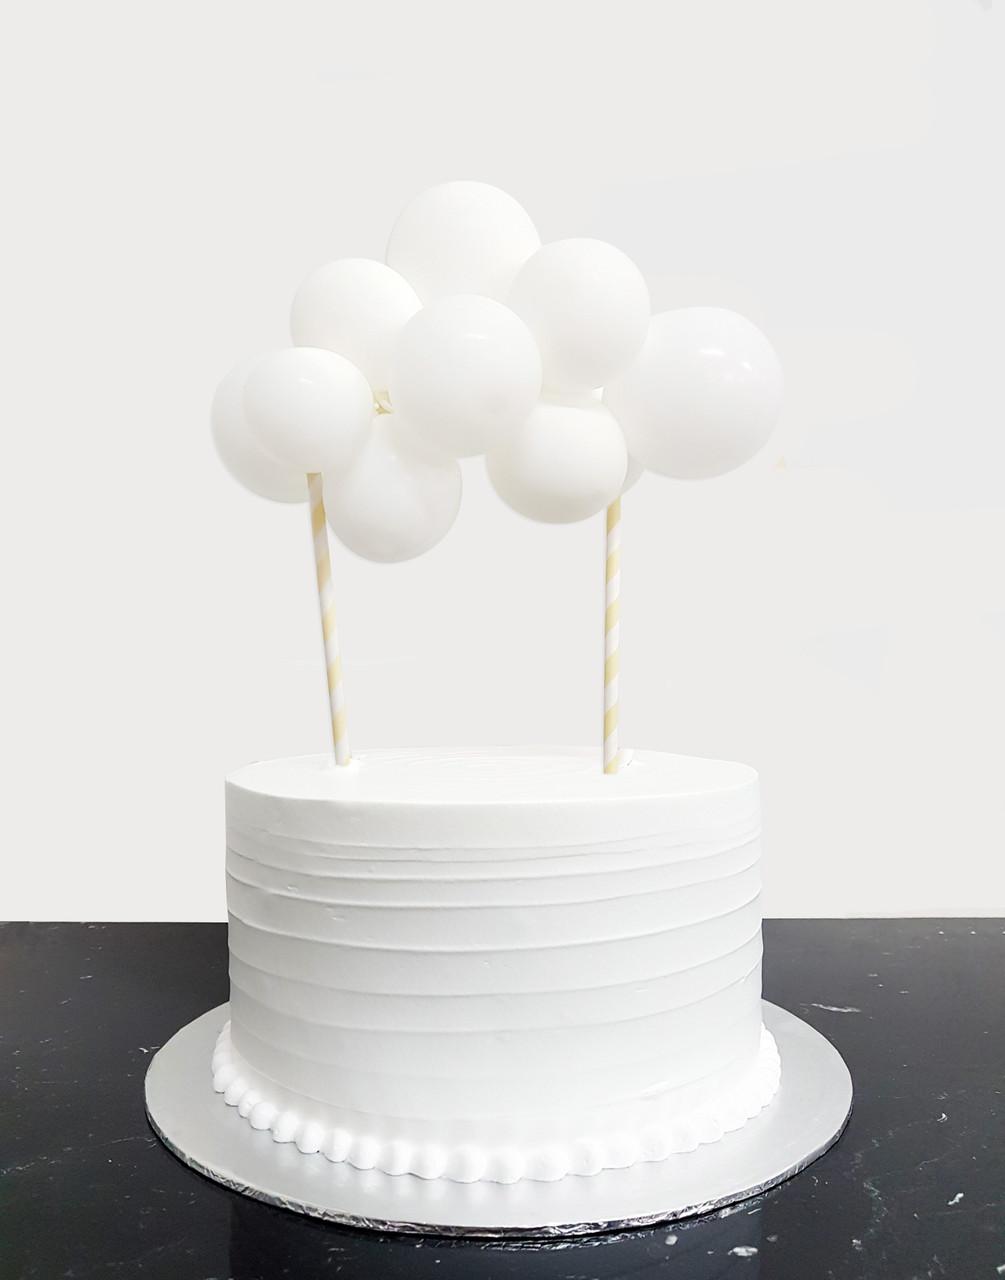 Petit Create Your Own Organic Balloon Garland Cake Topper Snow White Puffy Cloud Give Fun